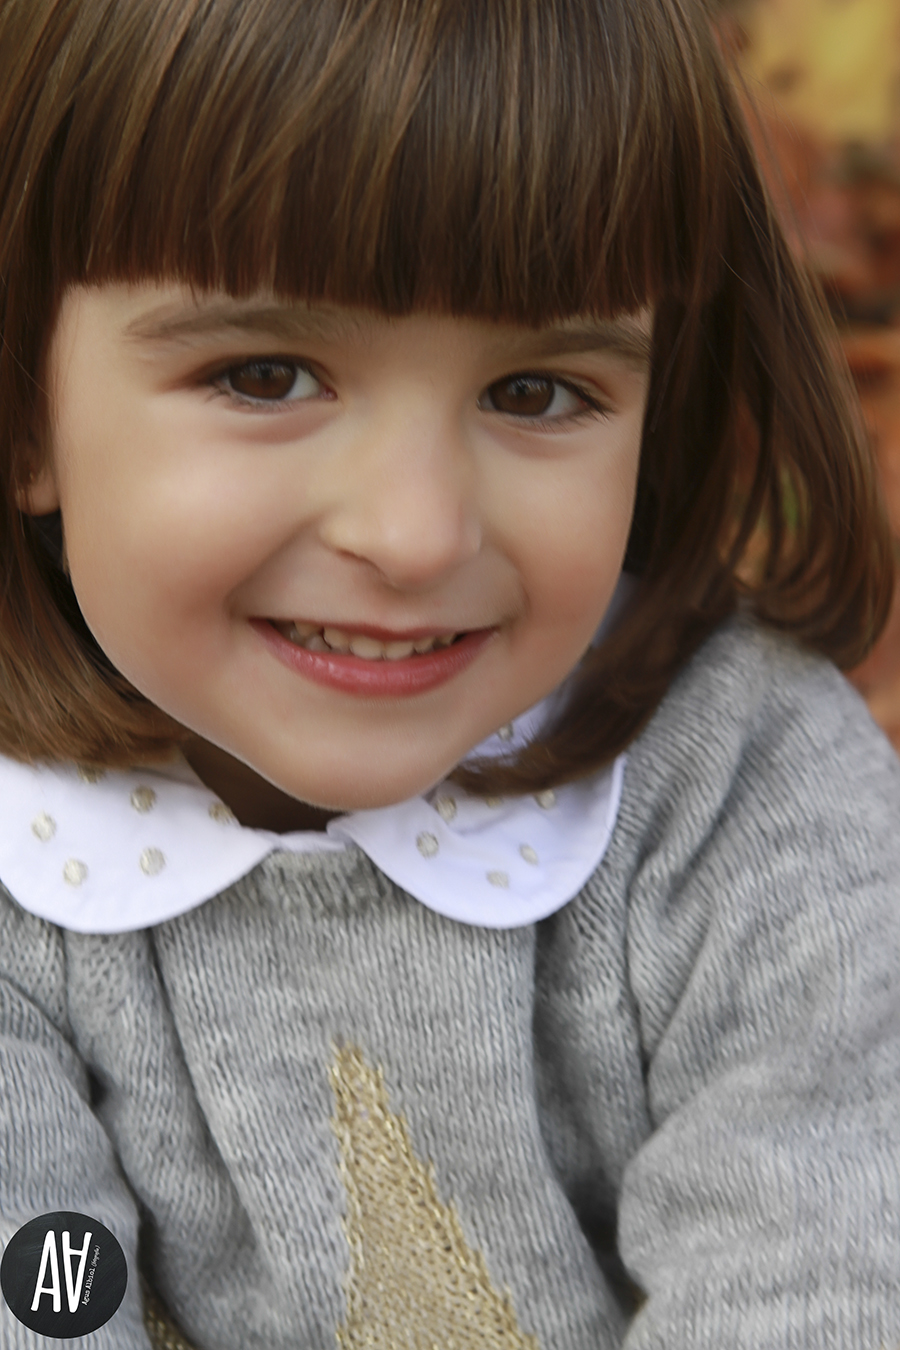 20-sesion familiar y niños barcelona - sesiones fotografia exterior - agus albiol fotografia